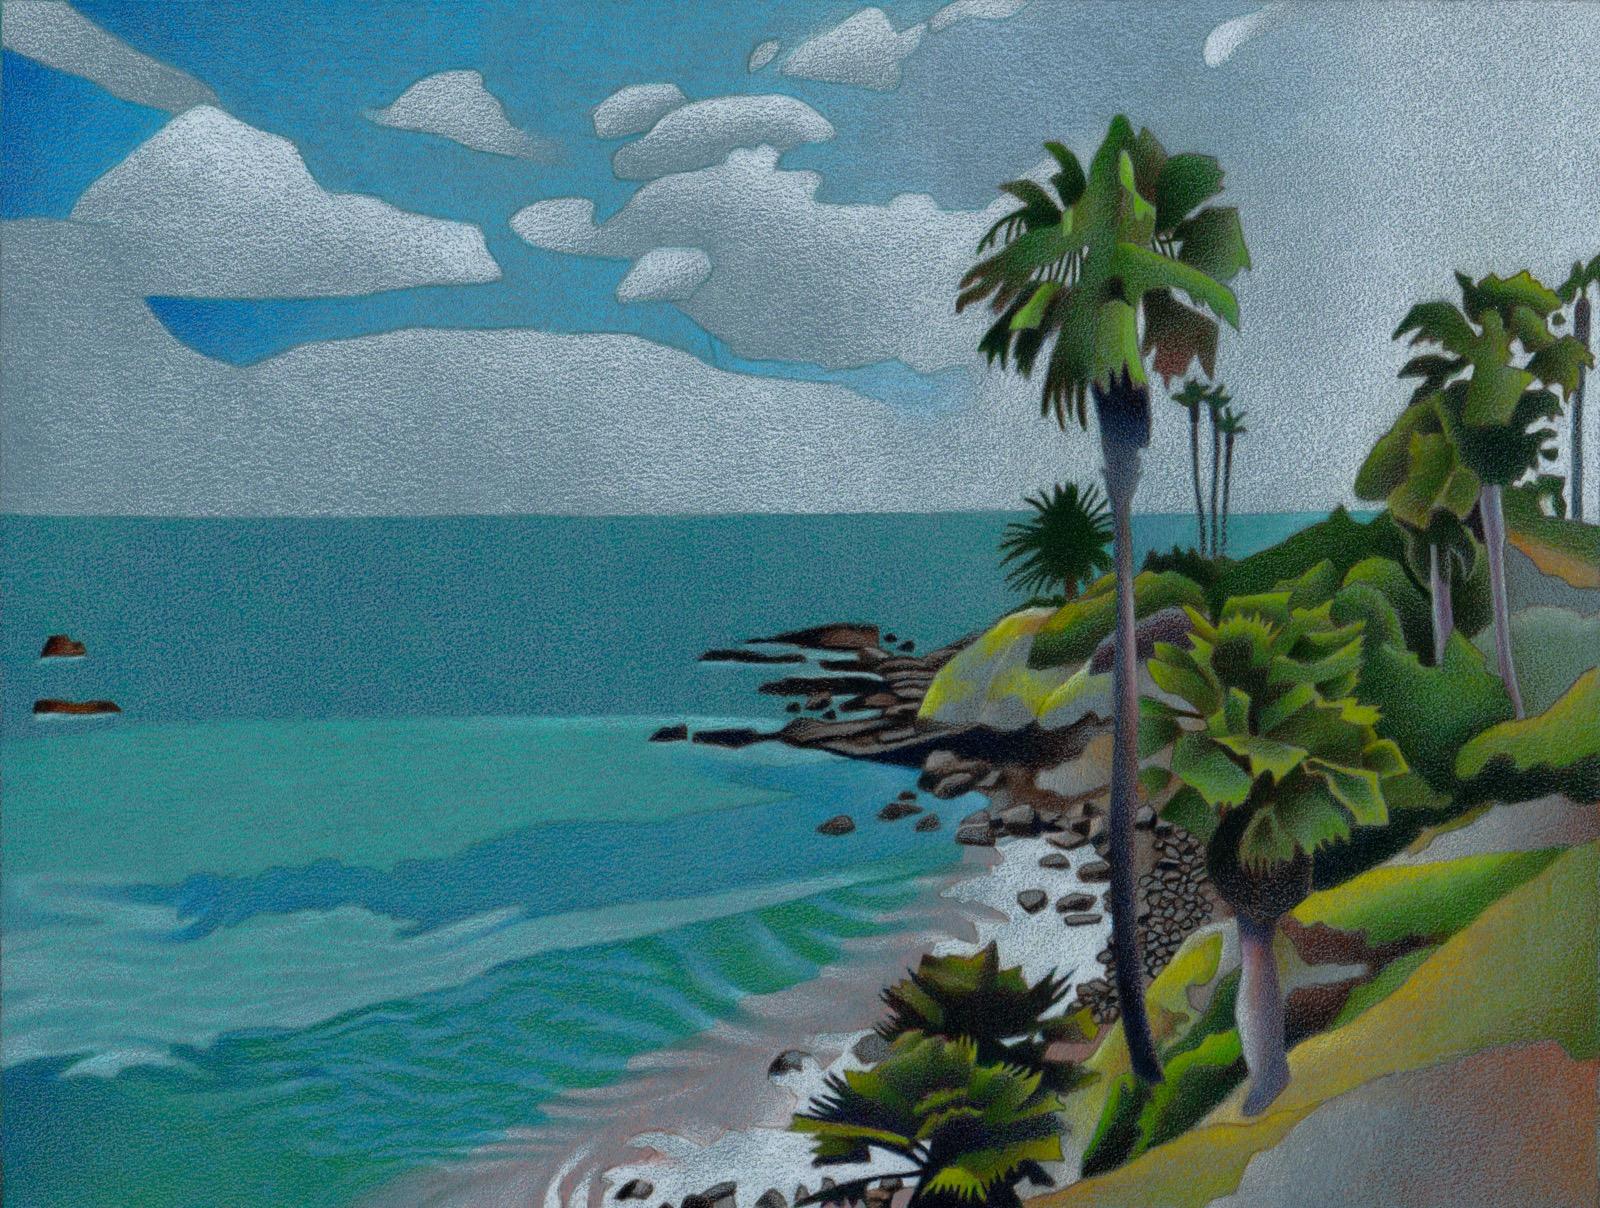 Impression Evergreen: Laguna Beach - Colored Pencil Drawing